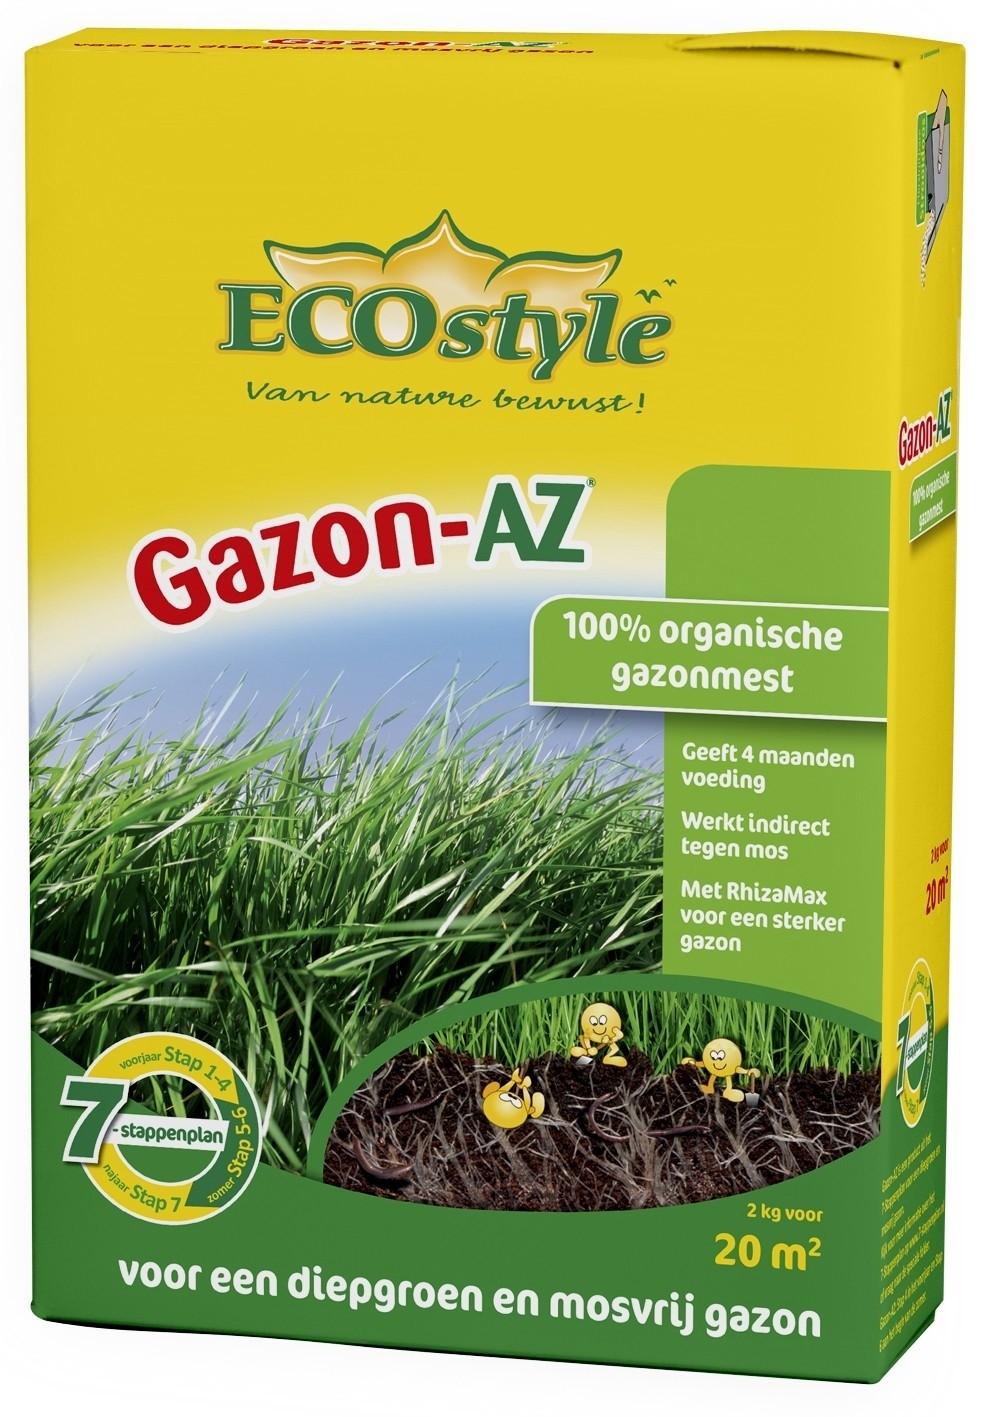 Gazon AZ Ecosyle 2kg